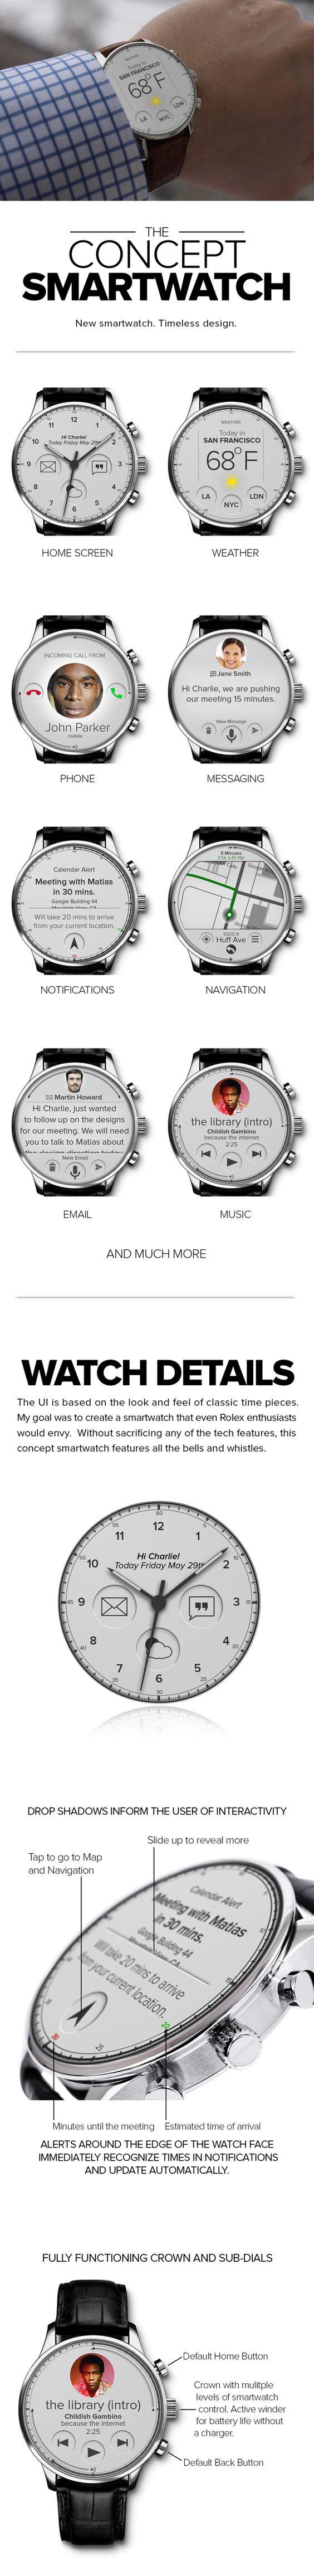 CONCEPT SMARTWATCH by Charlie No, via Behance [Wearable Electronics: http://futuristicnews.com/tag/wearable/ Smart Watches & Wearable Electronics for SALE: http://futuristicshop.com/category/smart-watches-wearable-electronics/]